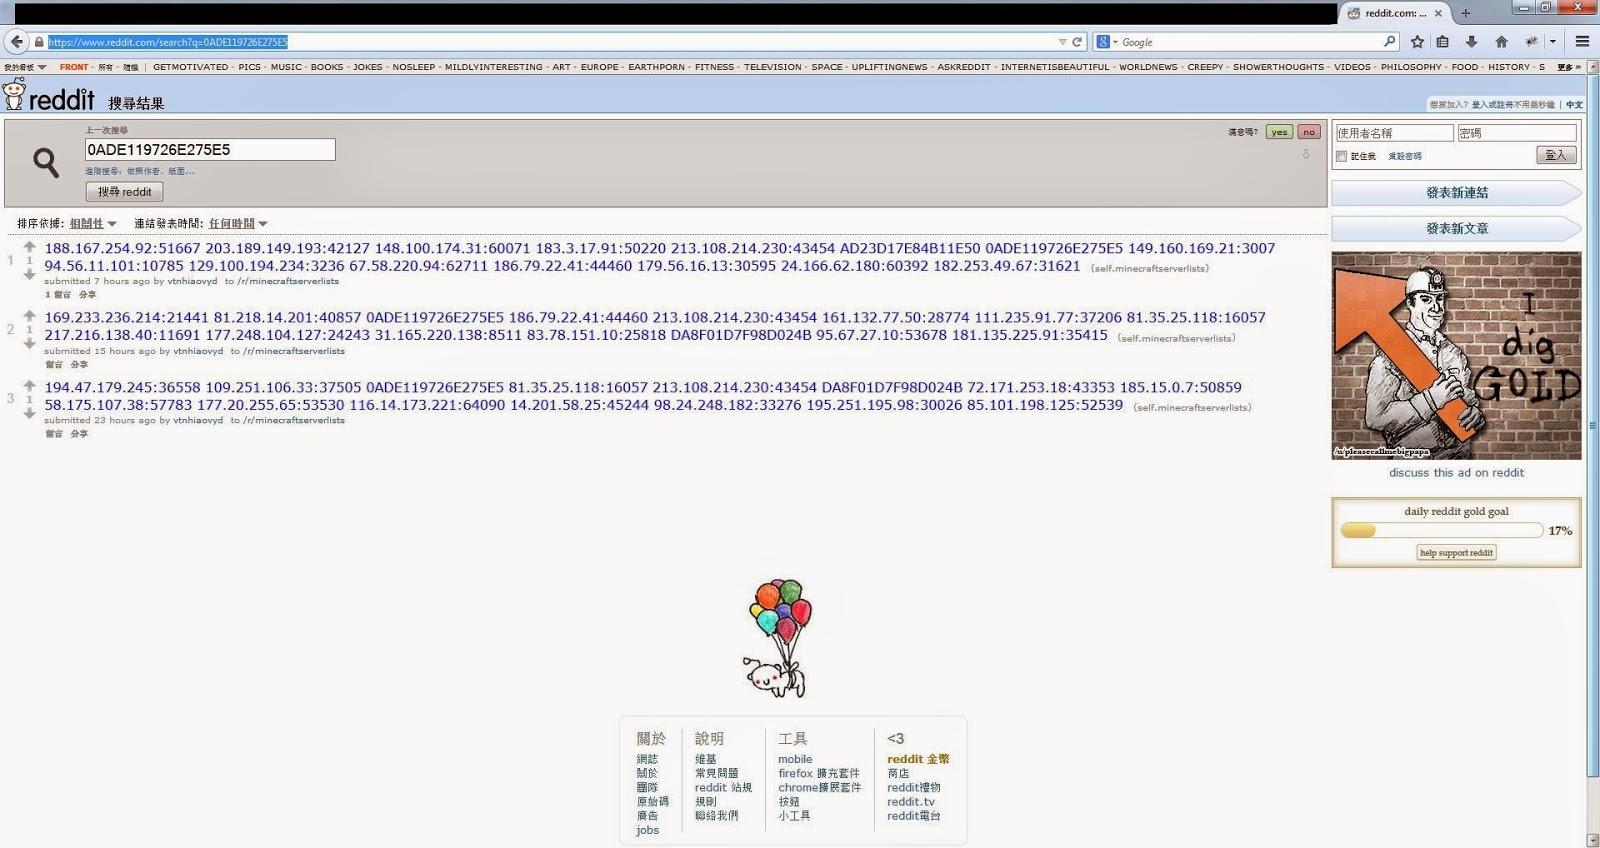 ' ' from the web at 'http://1.bp.blogspot.com/-vubBLFOu-SM/VDKPNjOOeyI/AAAAAAAAgjU/8pfftKMDH6A/s1600/Mac-malware.jpg'